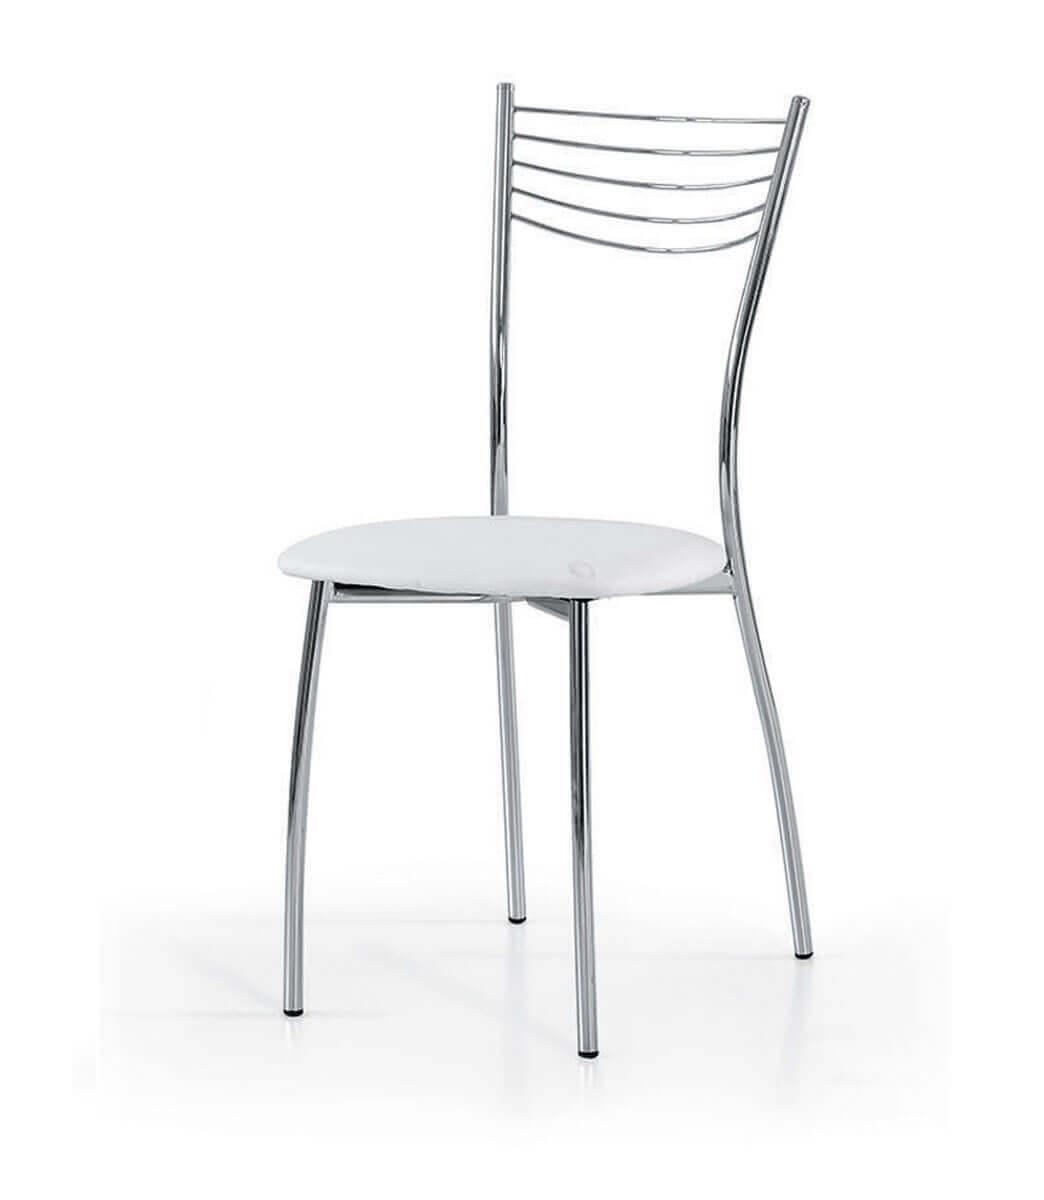 Sedie Acciaio E Plastica.Sedie In Acciaio E Ecopelle In Offerta Spazio Casa Sendero Deals